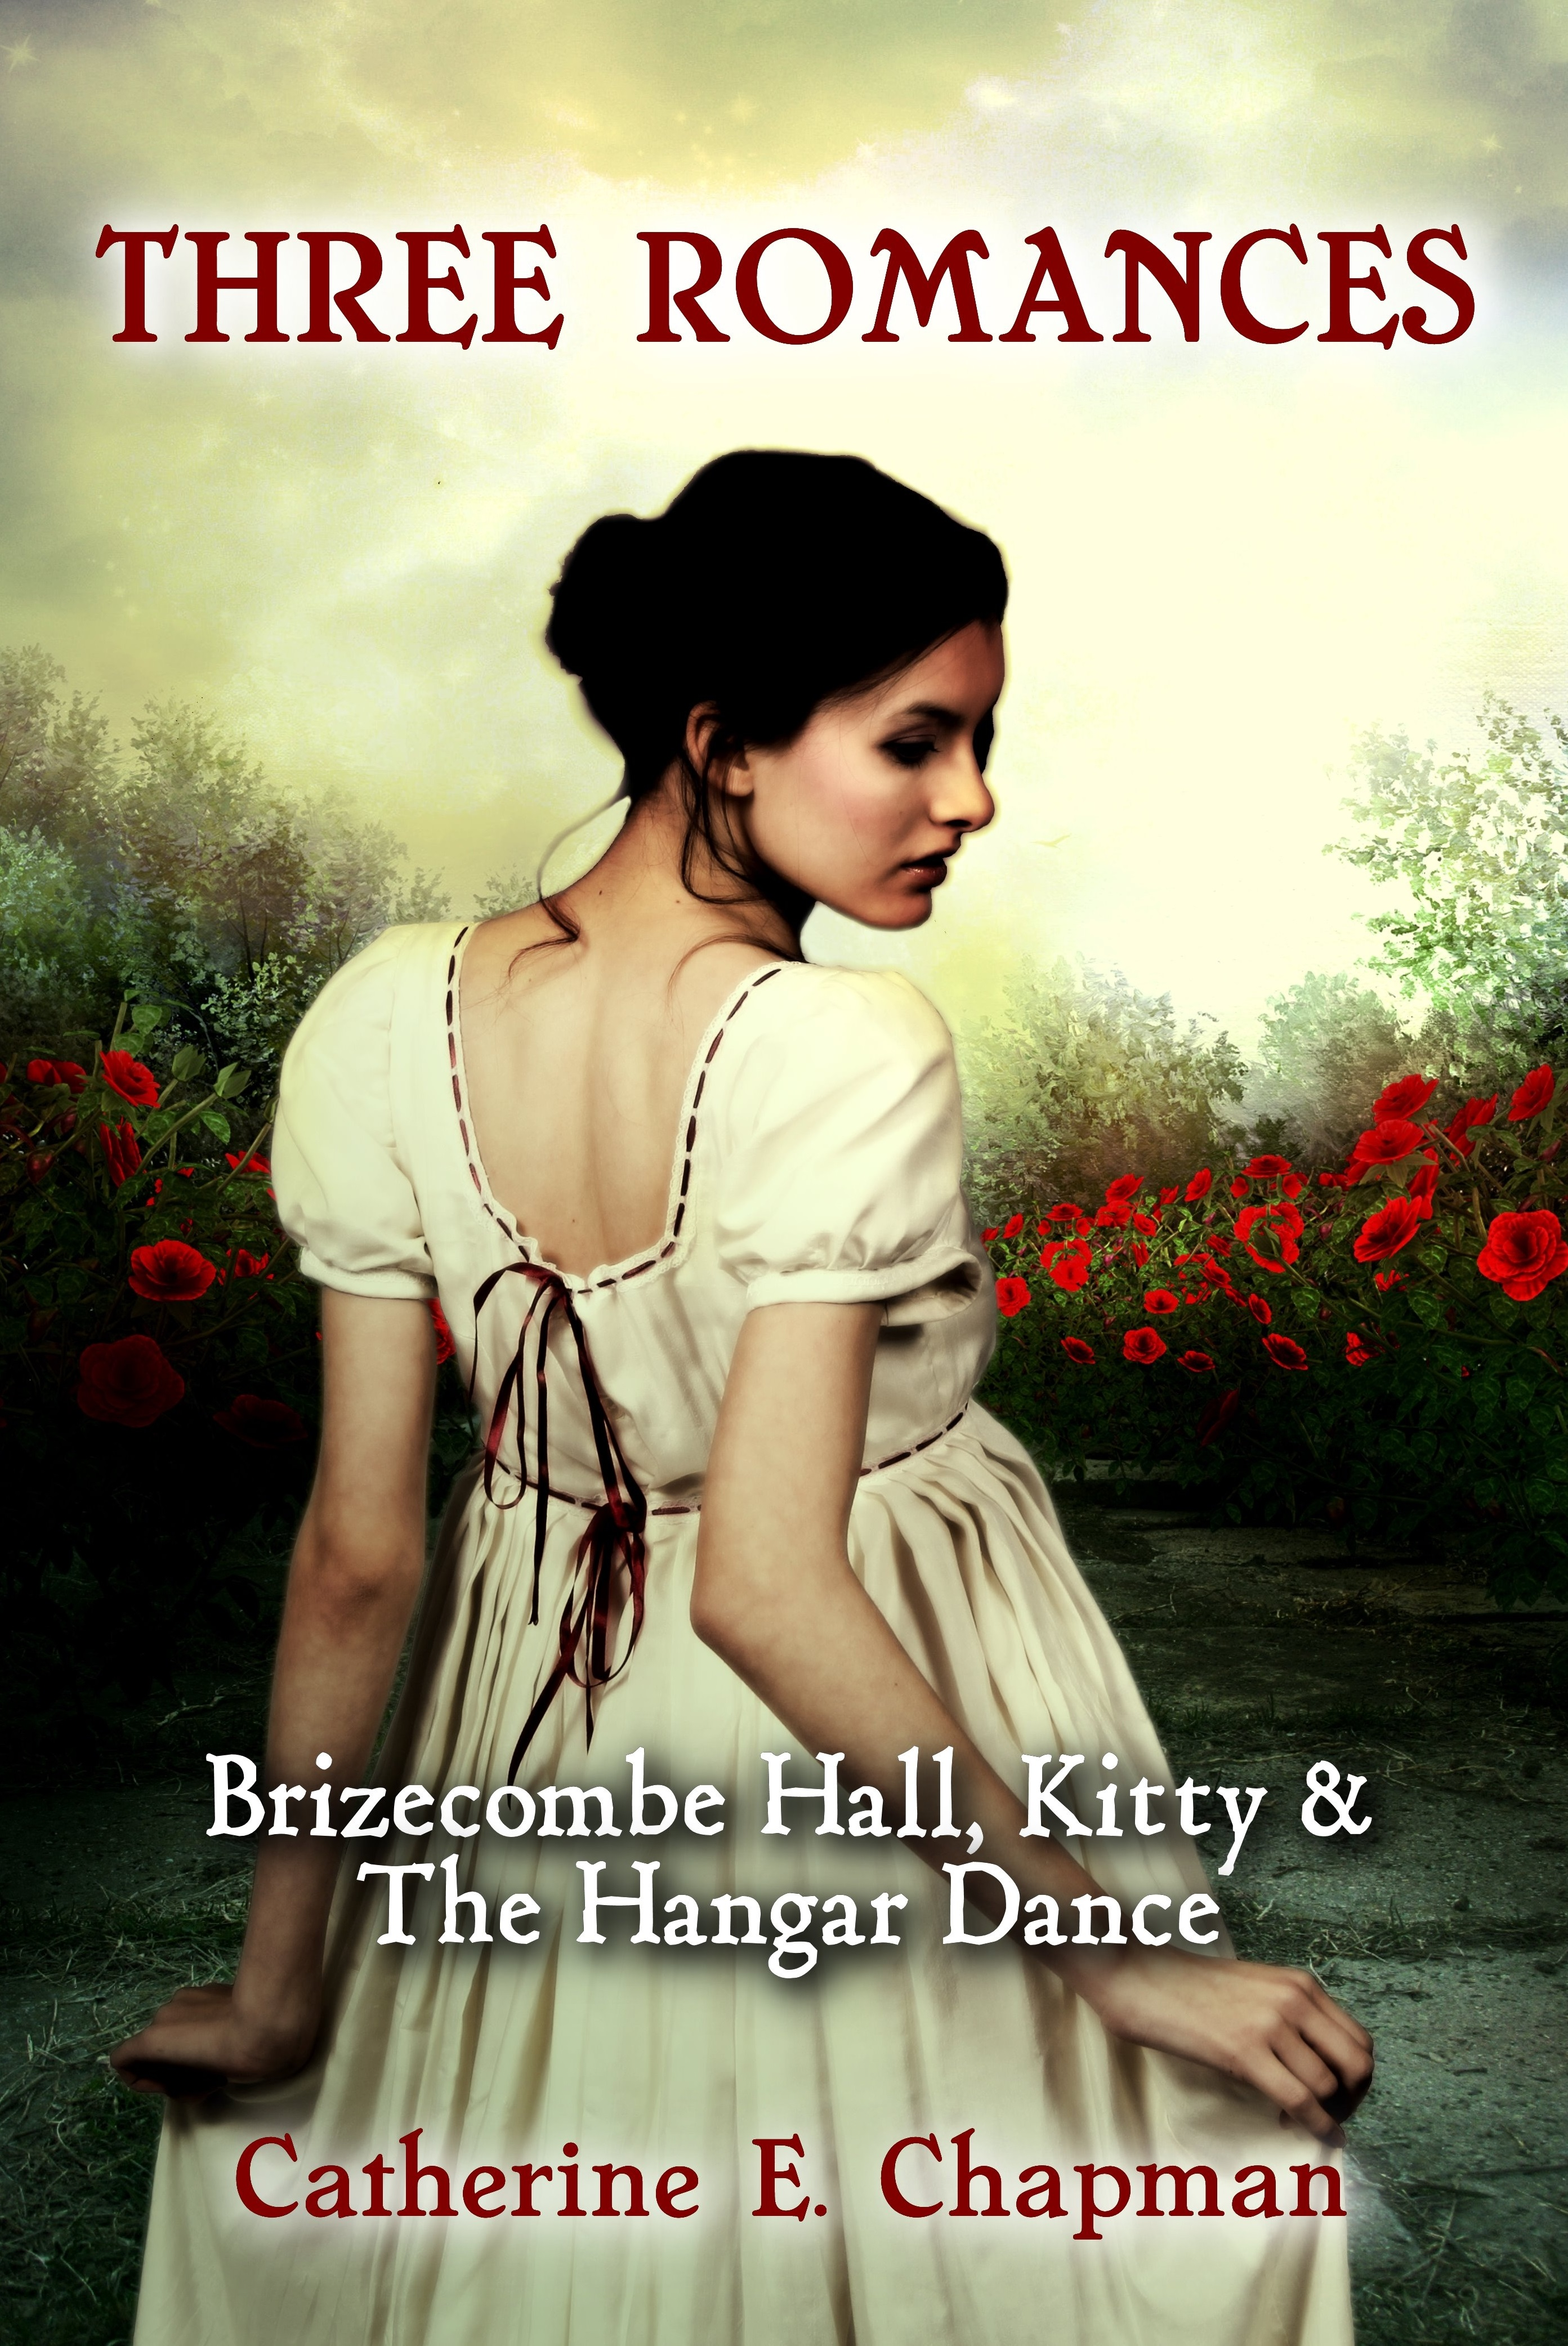 Three Romances: Brizecombe Hall, Kitty & The Hangar Dance